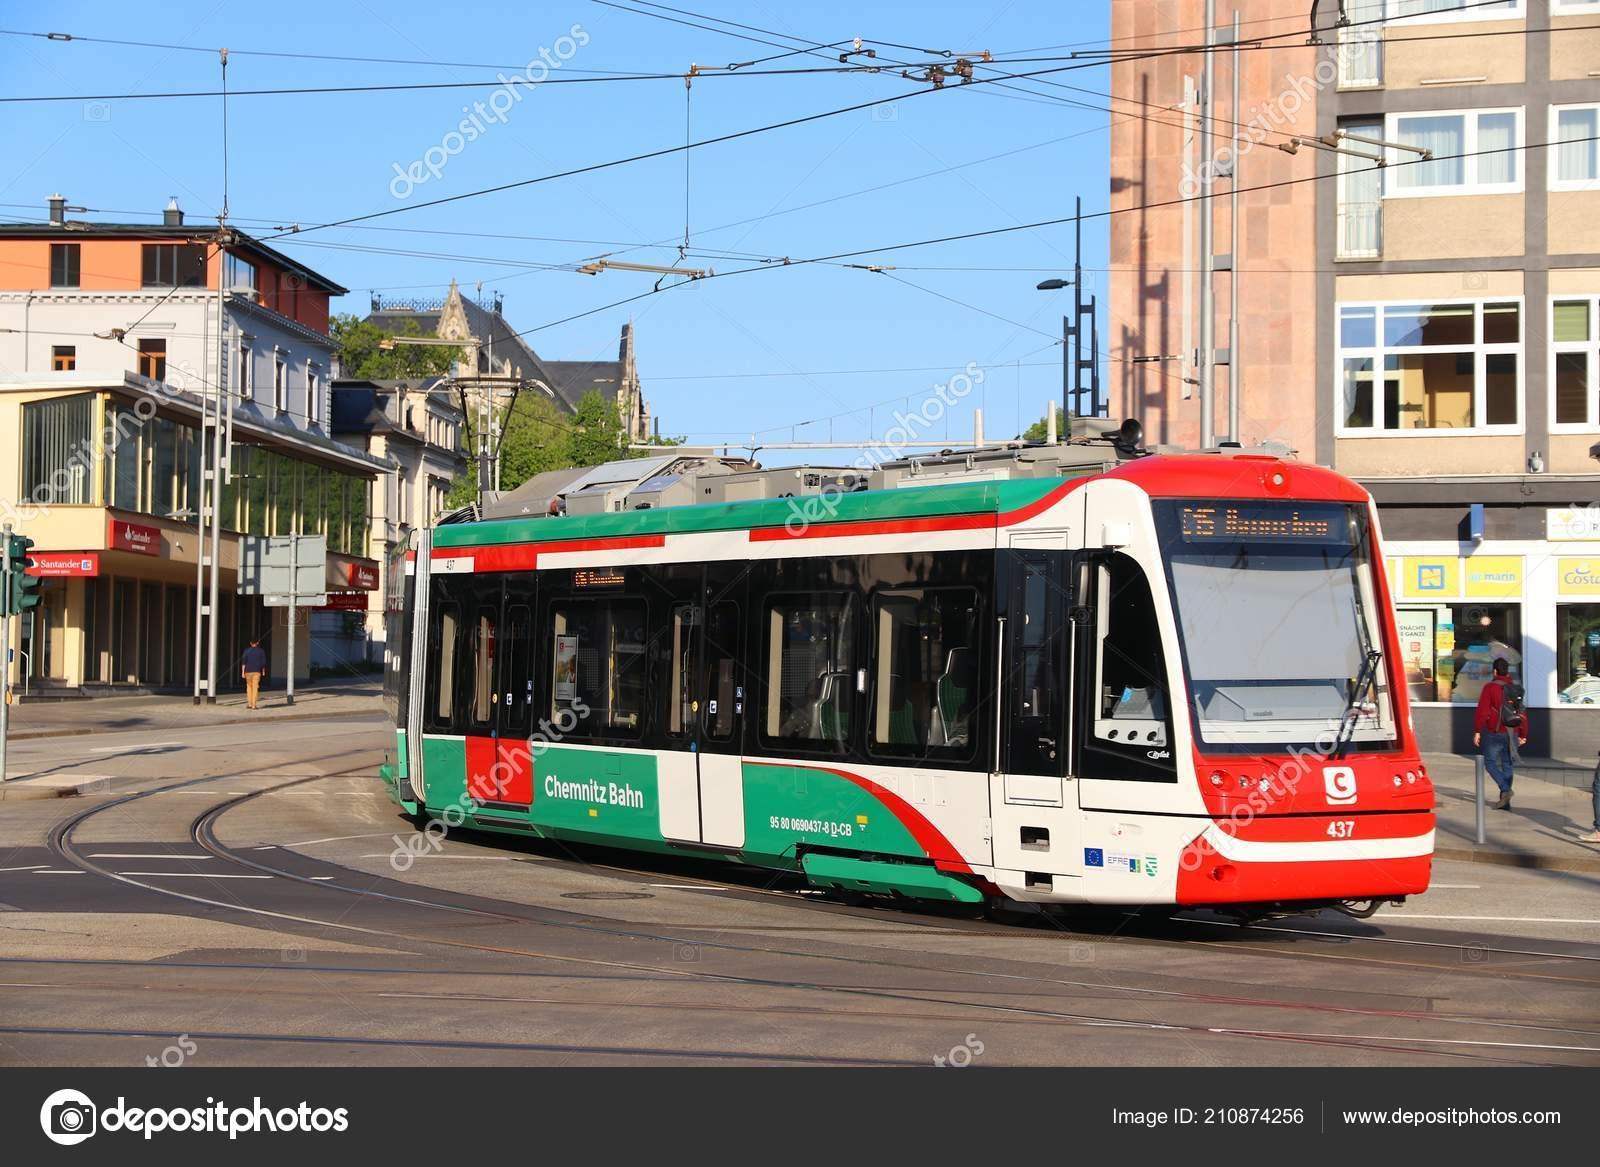 Chemnitz Germany May 2018 City Bahn Chemnitz Cbc Electric Tram